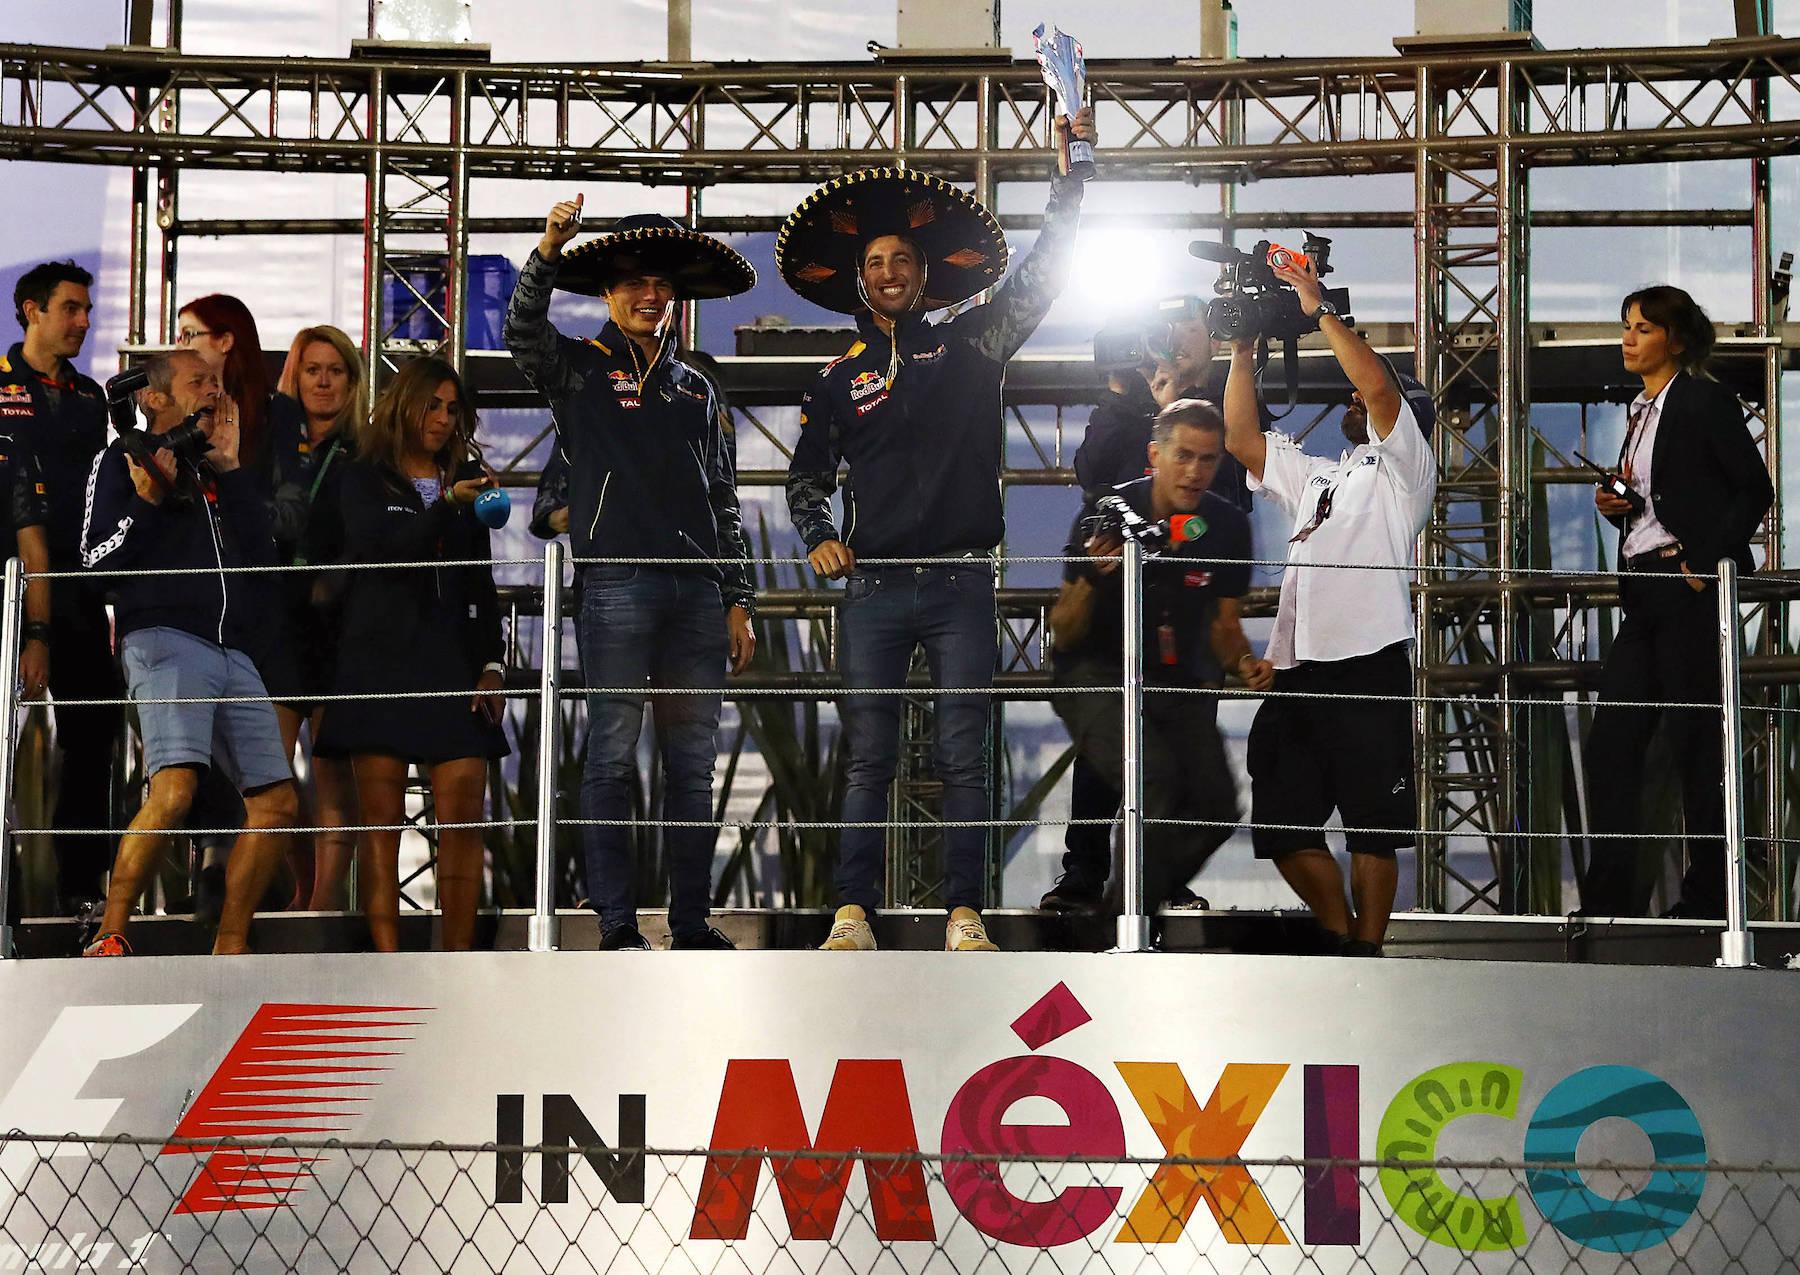 Salracing - Red Bull Racing drivers